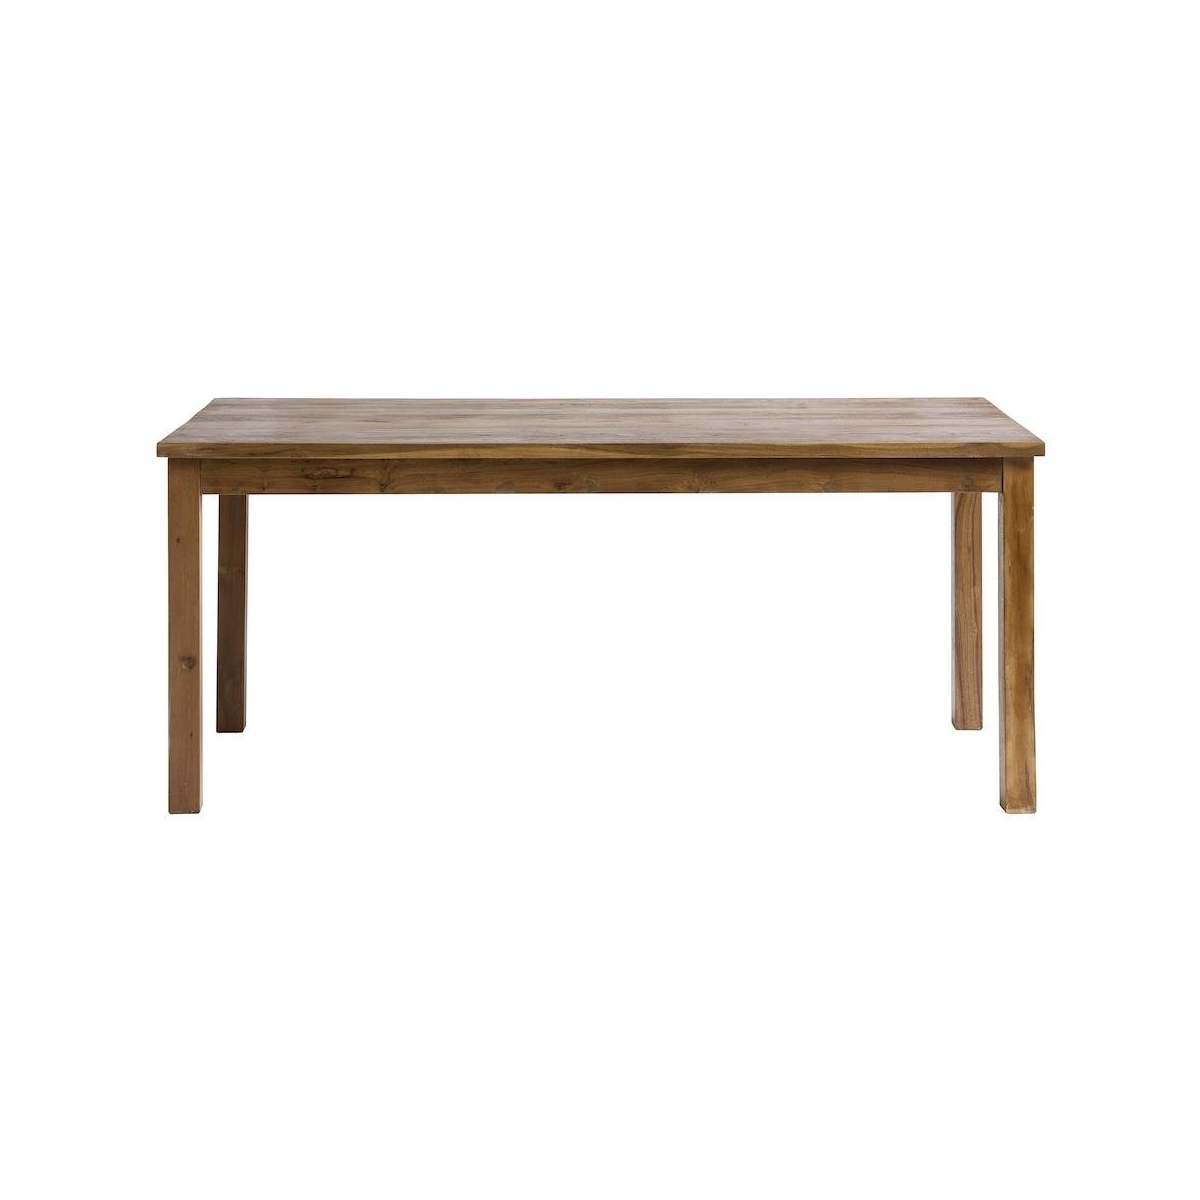 Matbord i teak 175 cm , Nordal